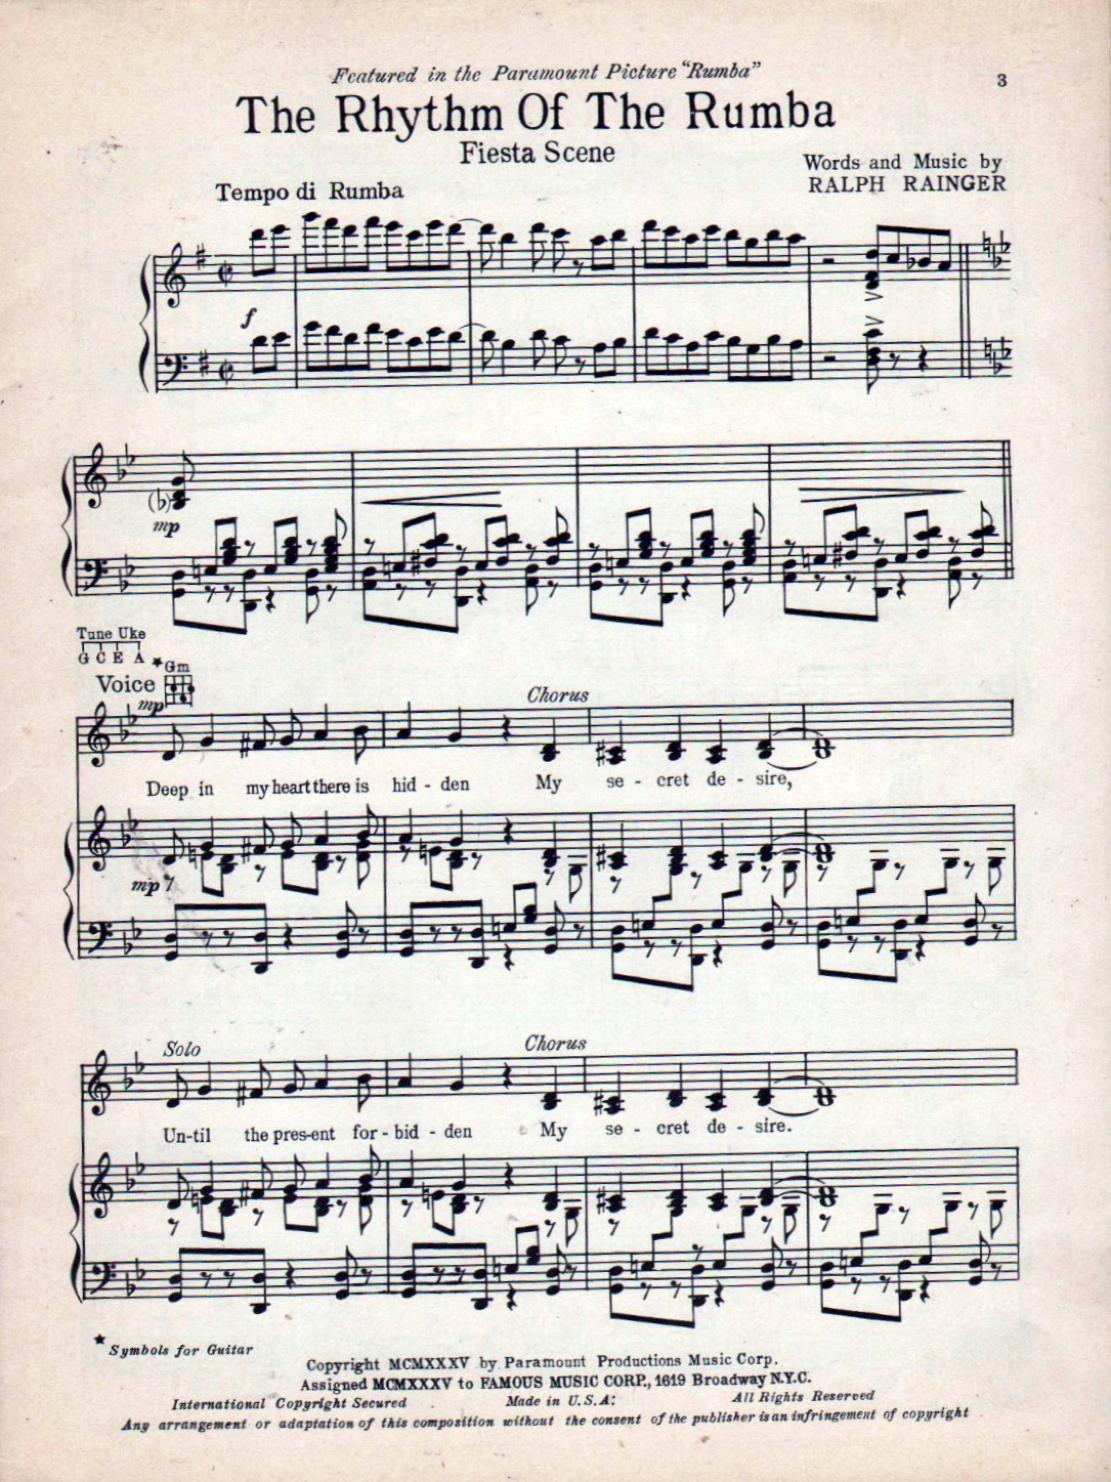 carole lombard rumba the rhythm of the rumba 01a